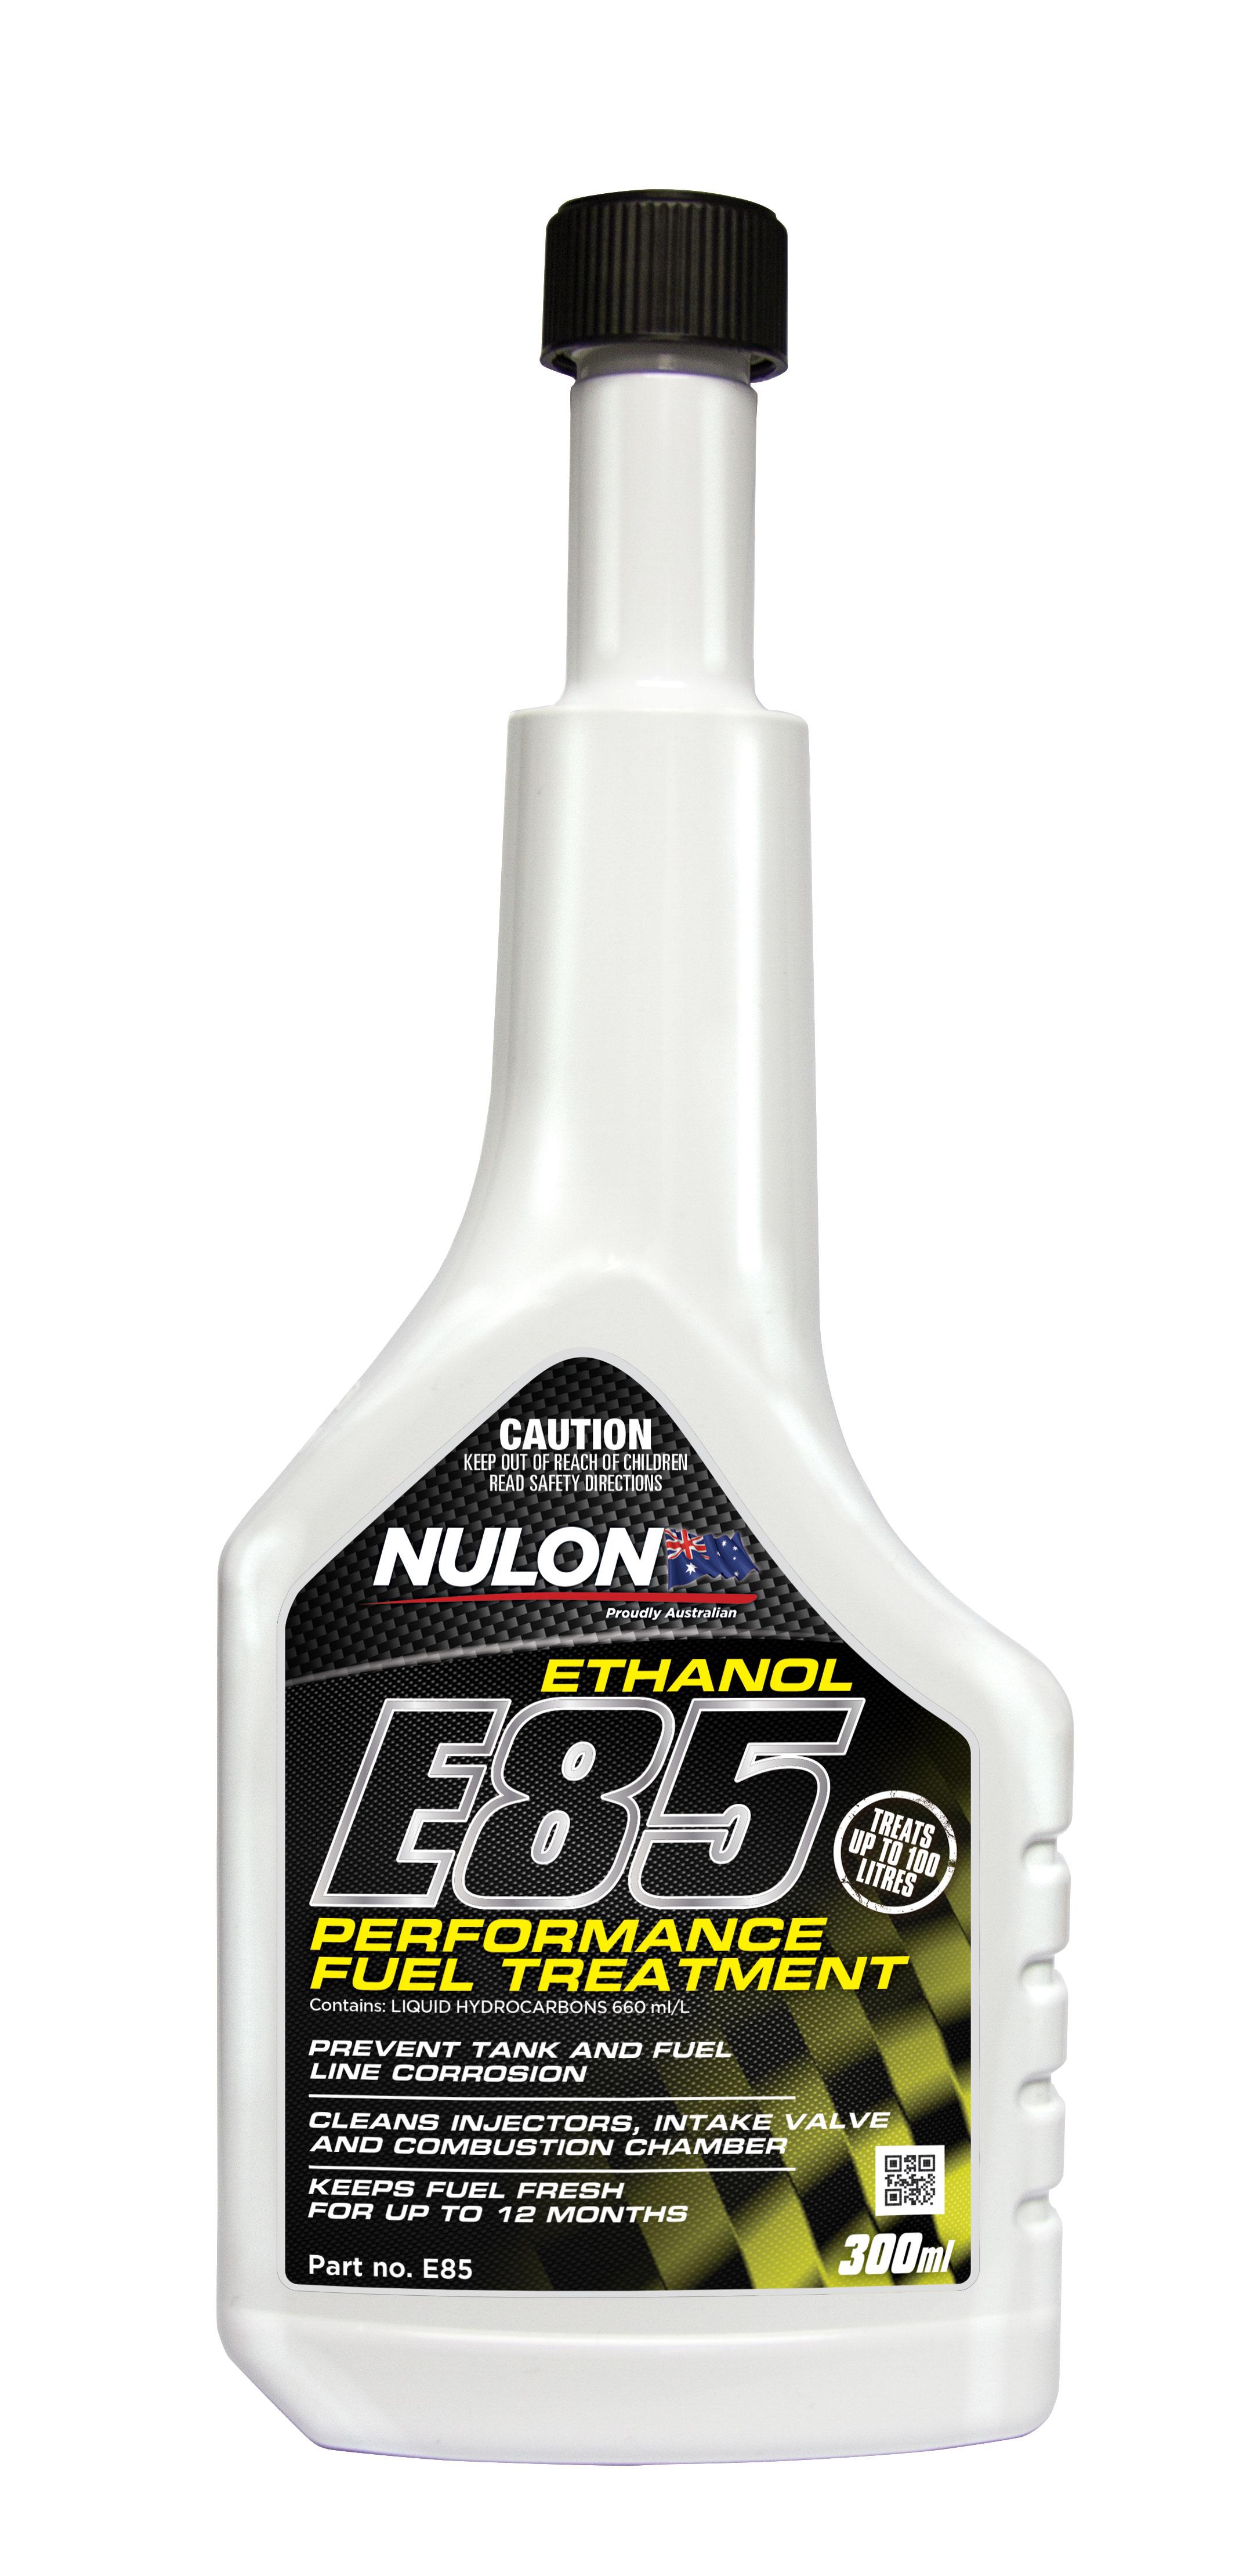 box of 6 nulon ethanol e85 performance fuel treatment 300ml e85 ebay. Black Bedroom Furniture Sets. Home Design Ideas